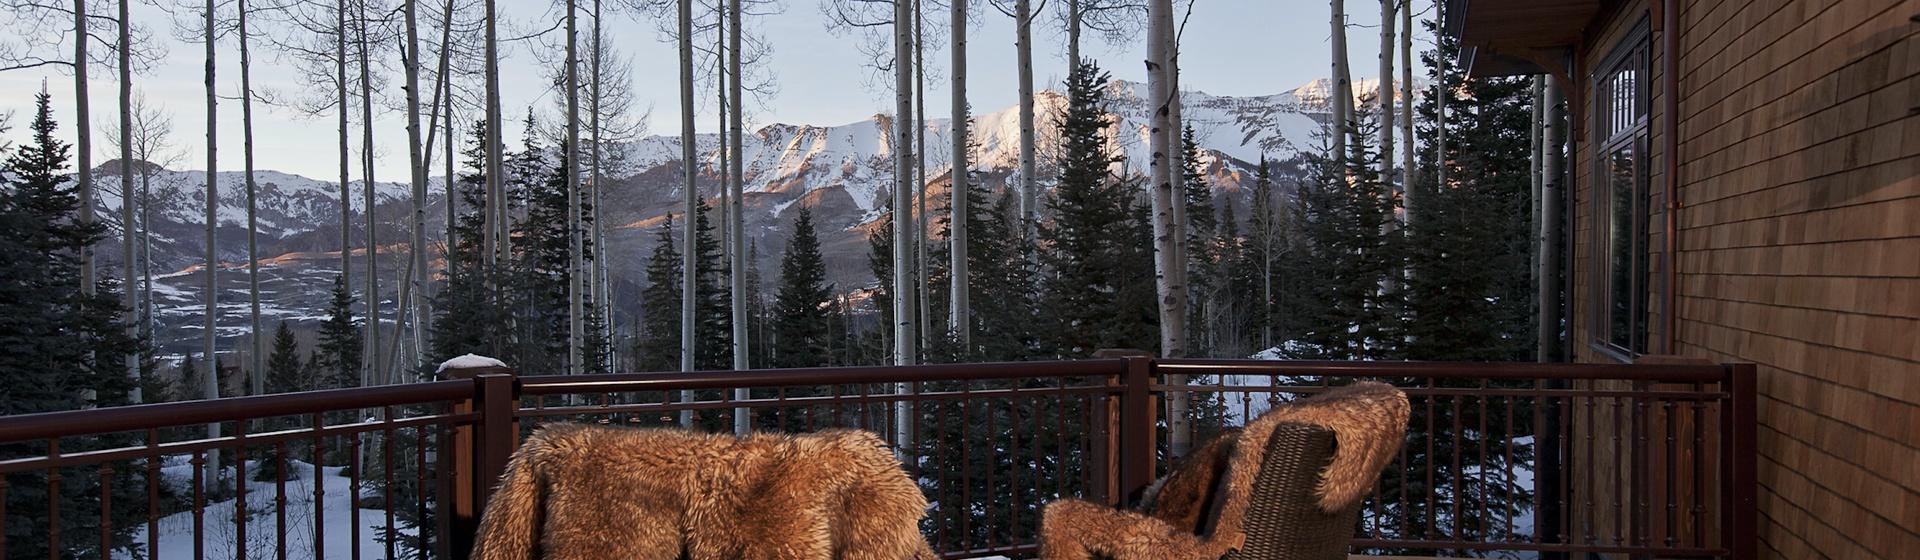 7.02-mountain-village-hood-park-manor-deck-patio-track.jpg